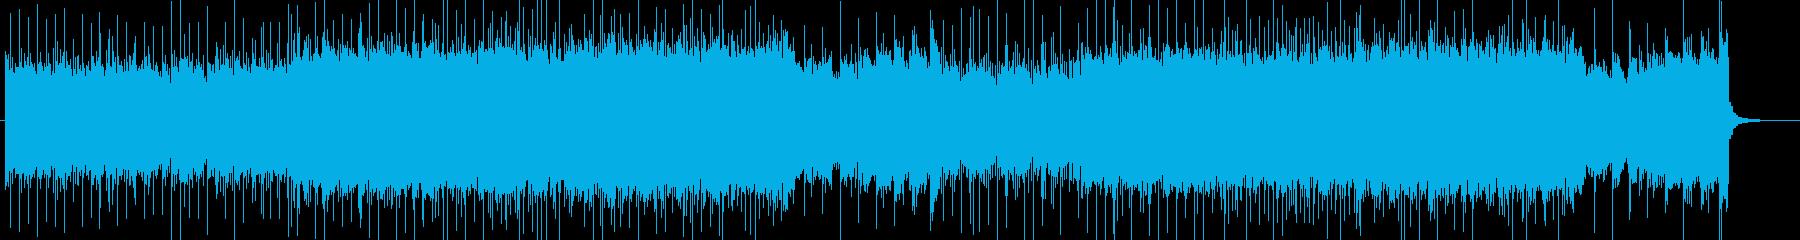 「HR/HM」「ROCK」BGM153の再生済みの波形